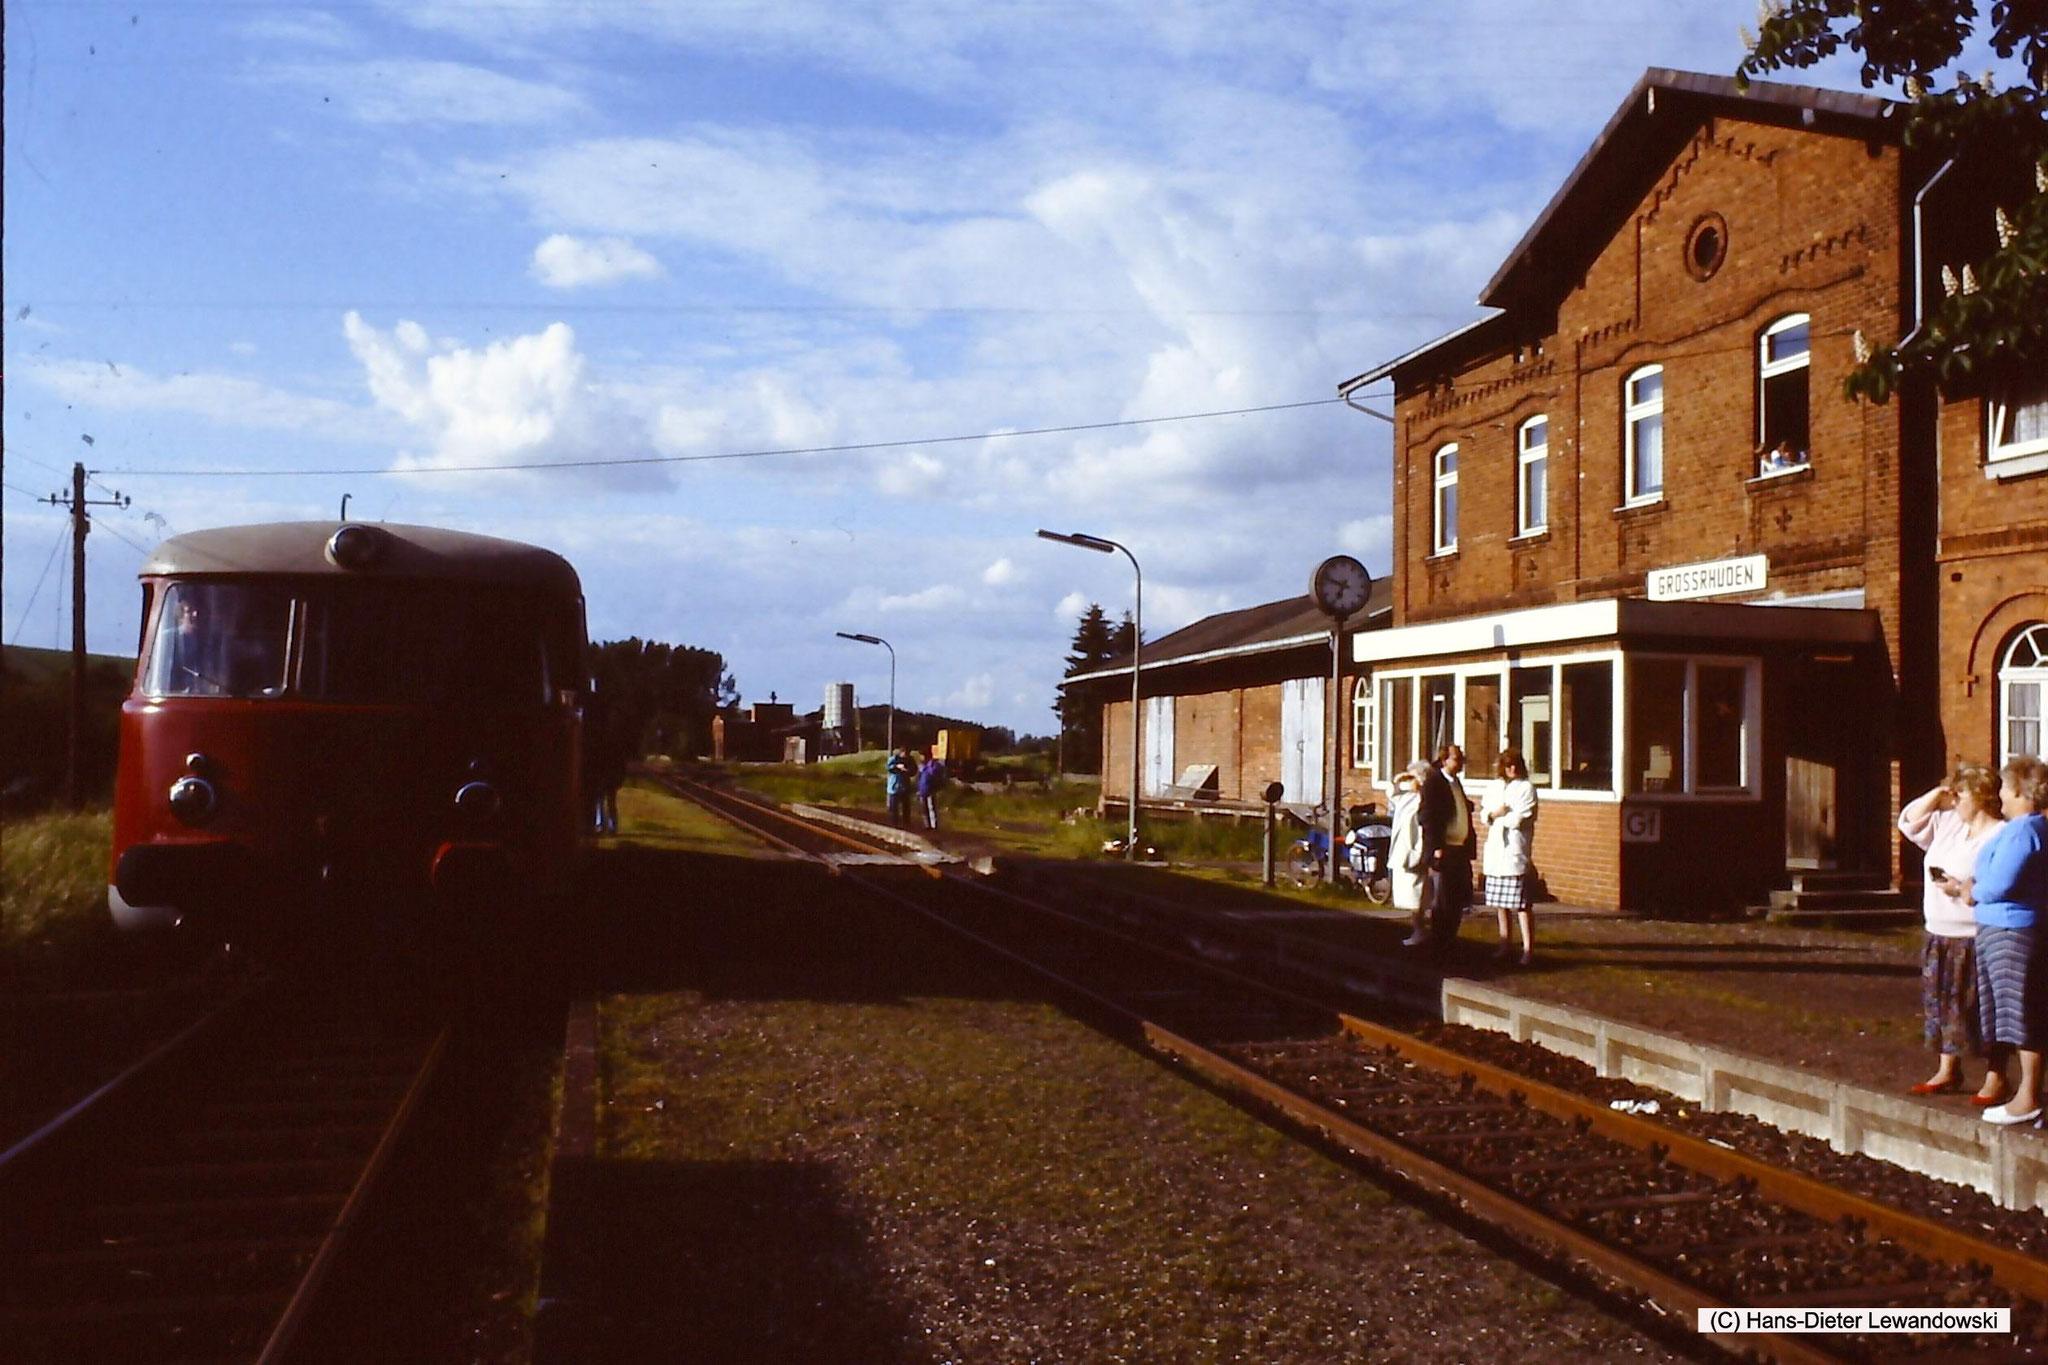 Bahnhof Grossrhüden mit MAN - VT 1 der Dampflok-Gemeinschaft 41 096 e.V.